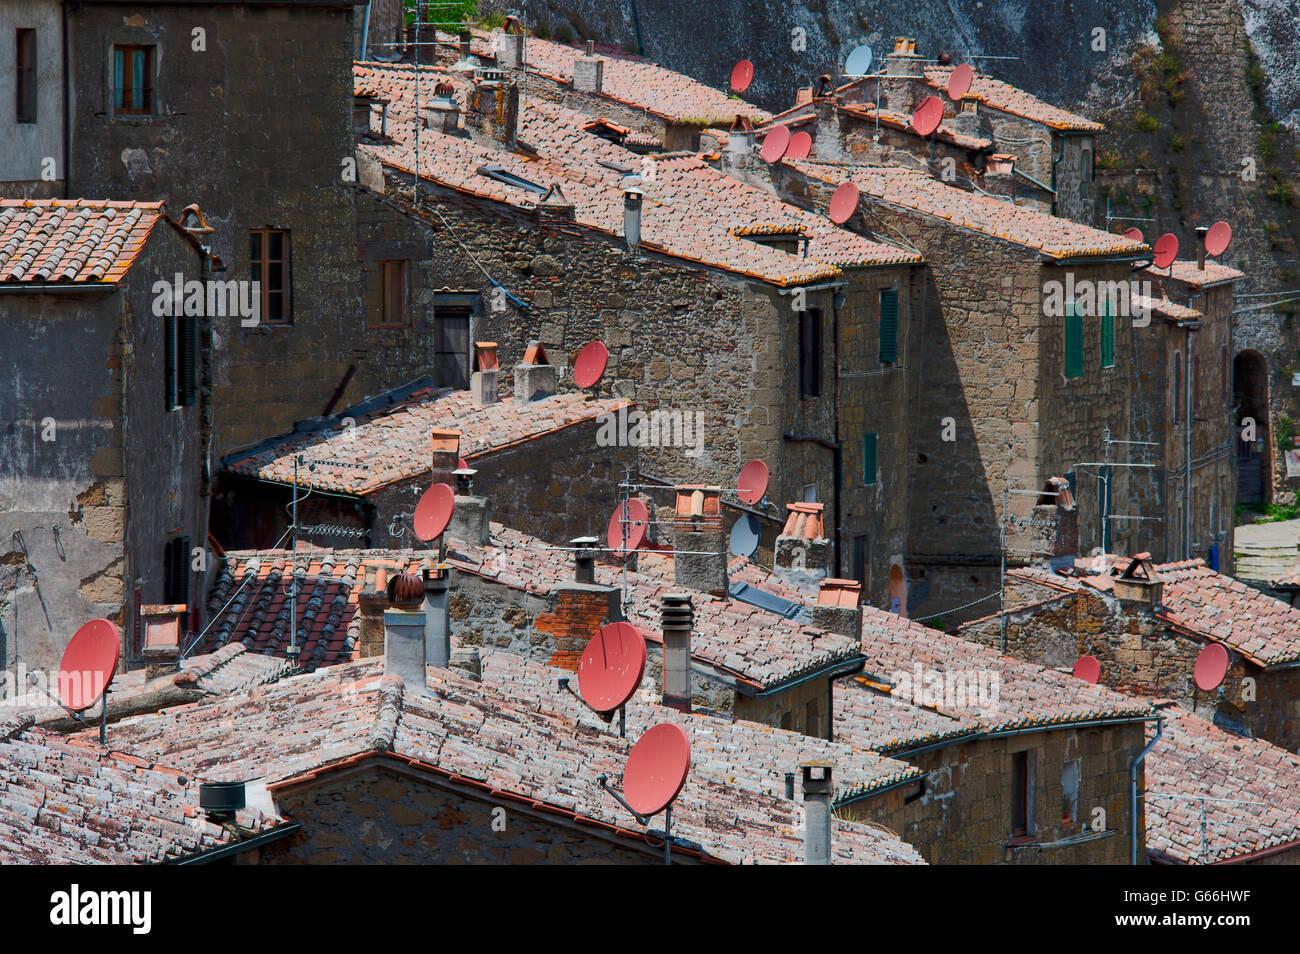 Satellite Tv dishes on terracotta tiled roofs in Sovana - Stock Image